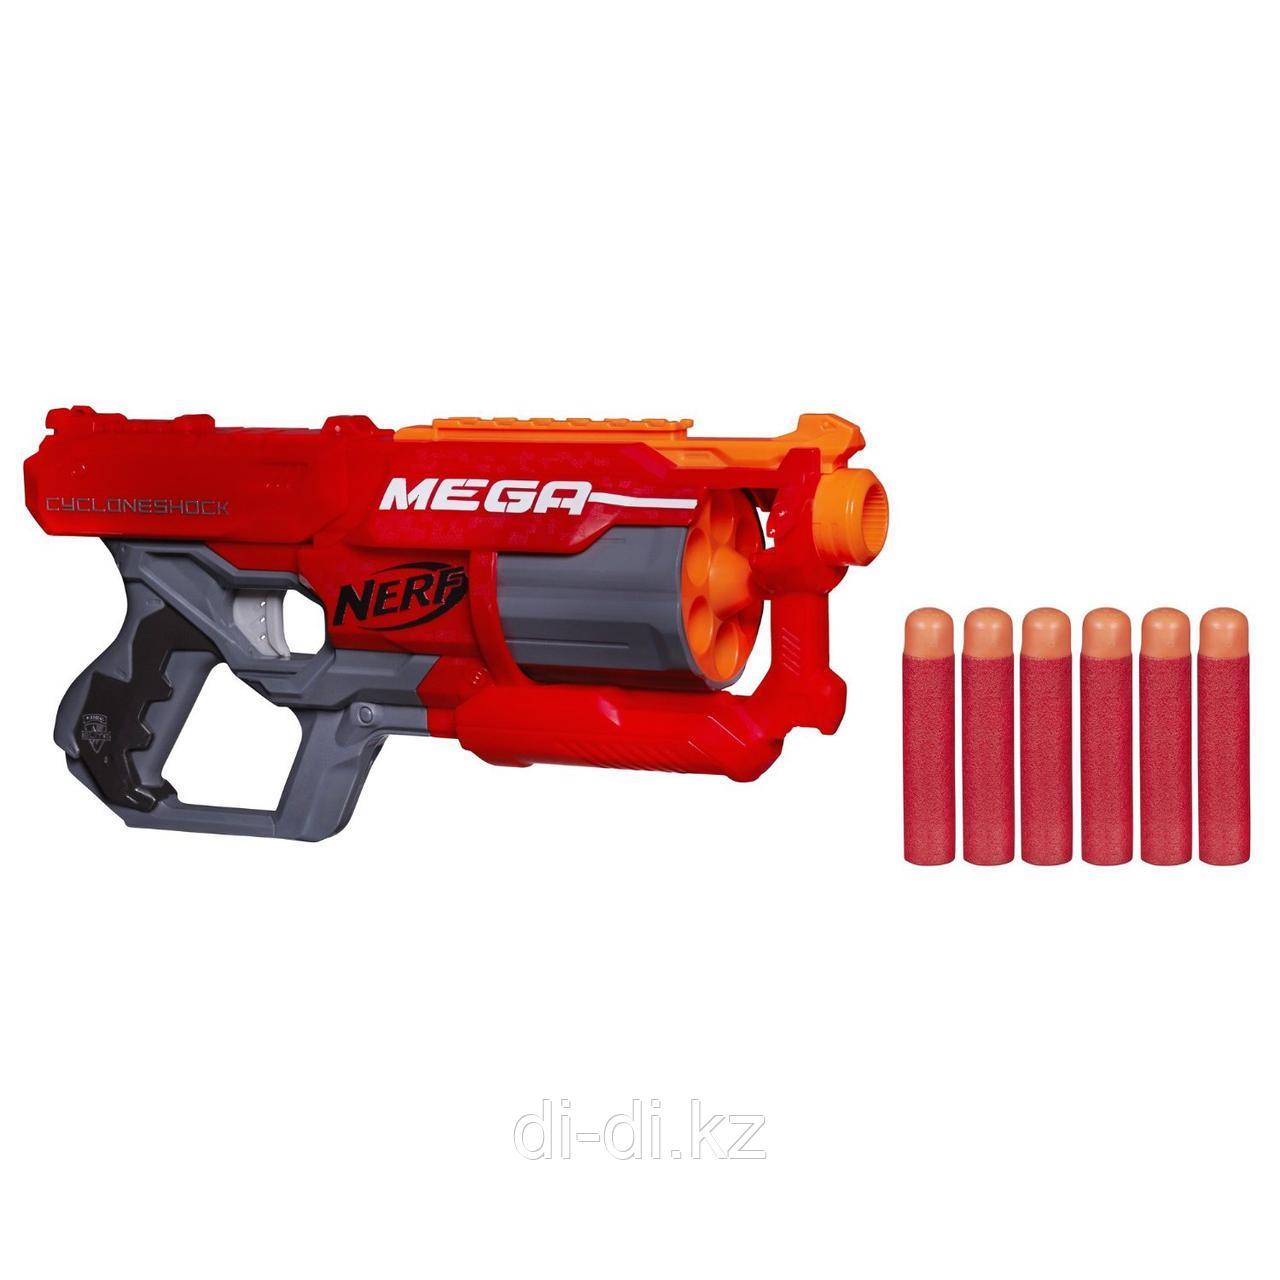 Игрушечное оружие NERF Бластер Мега Циклон-шок